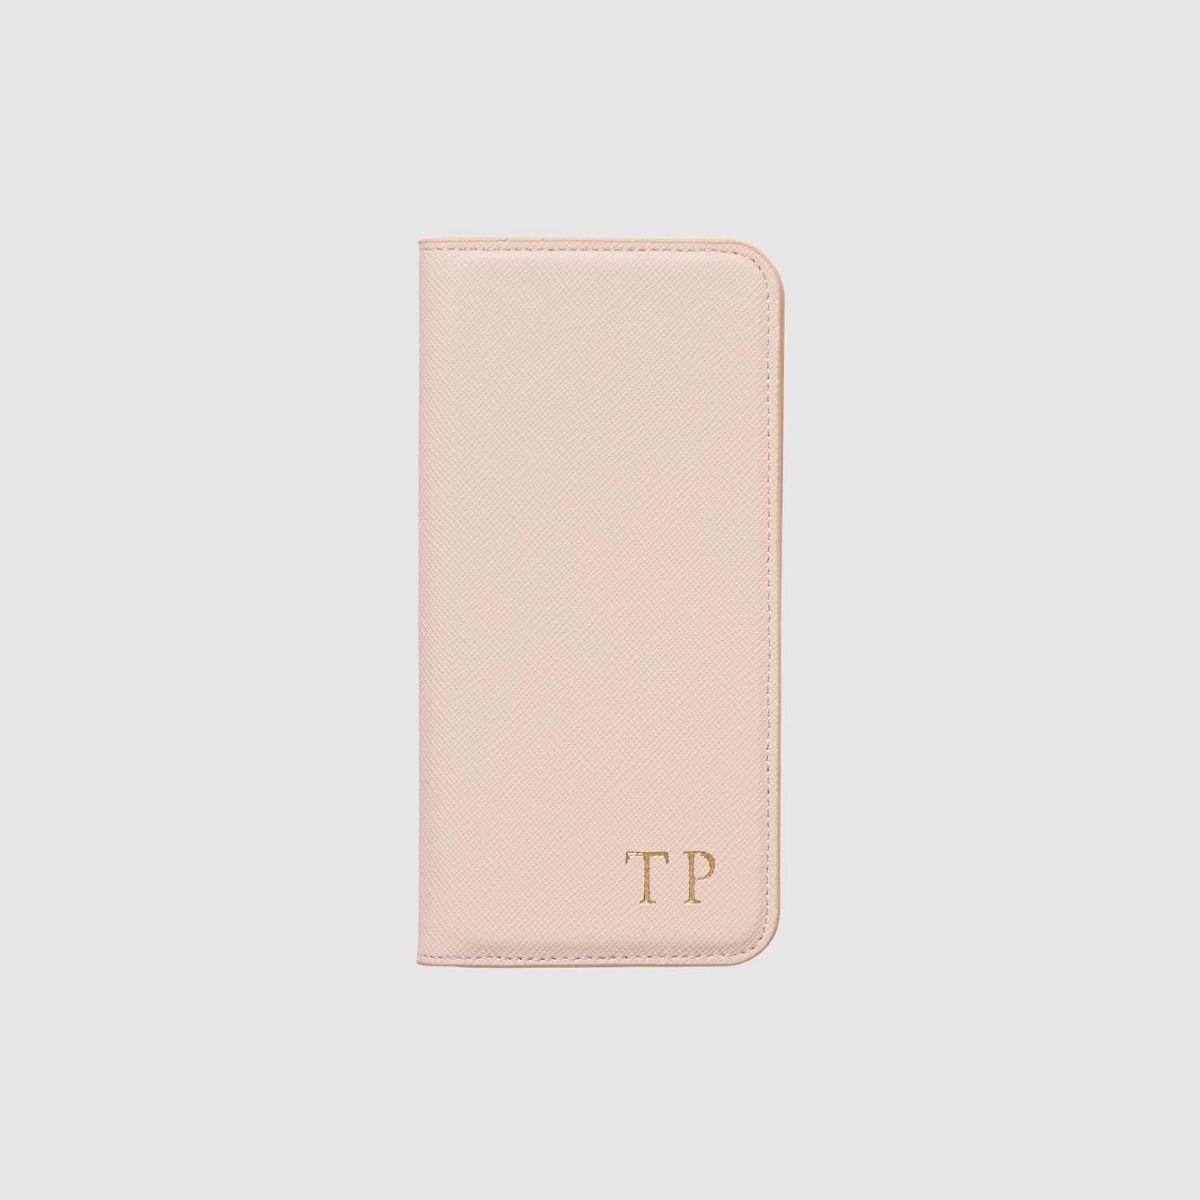 iphone6f-st-ppi-zz-1-gzb-01.jpg